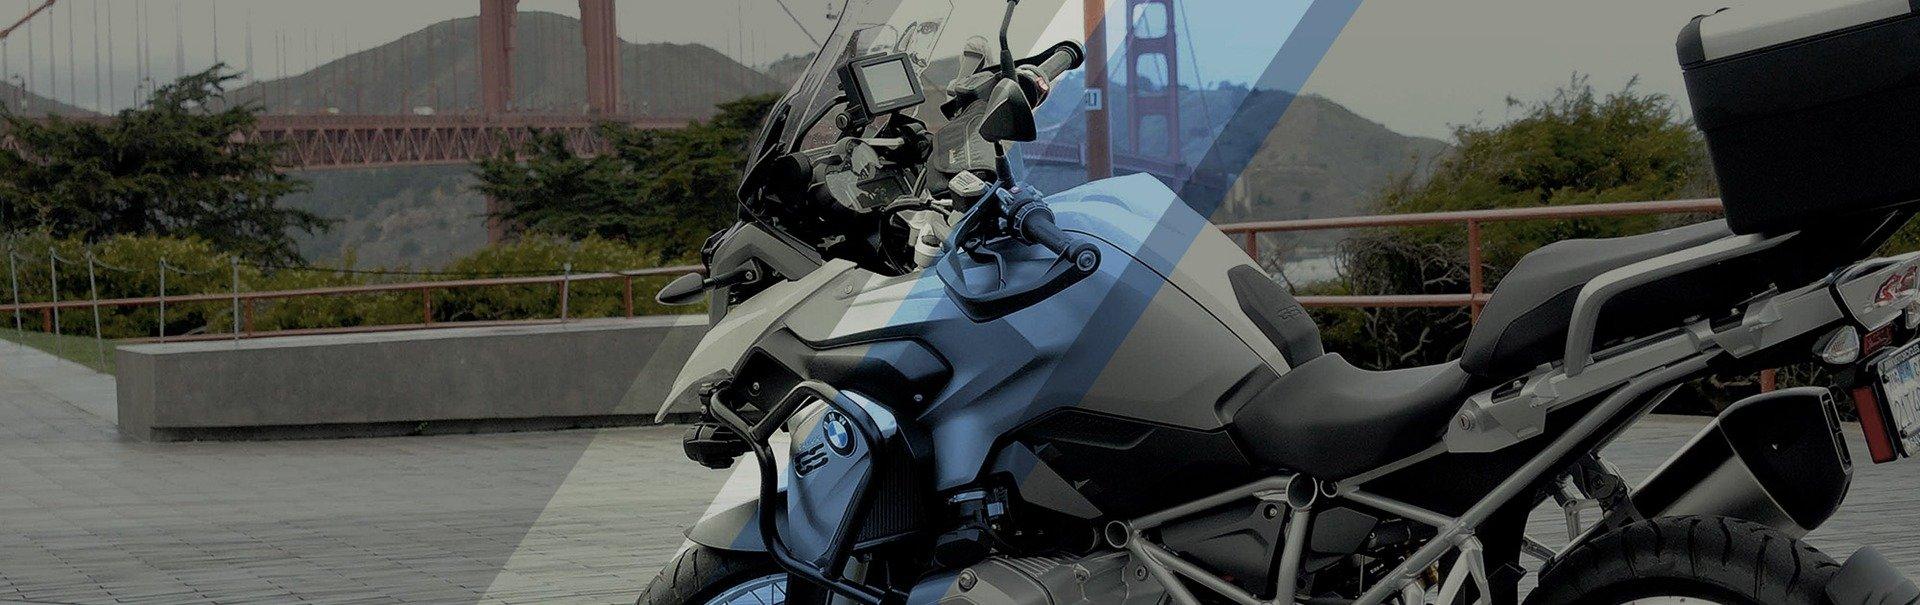 Motorcycle Rentals in California